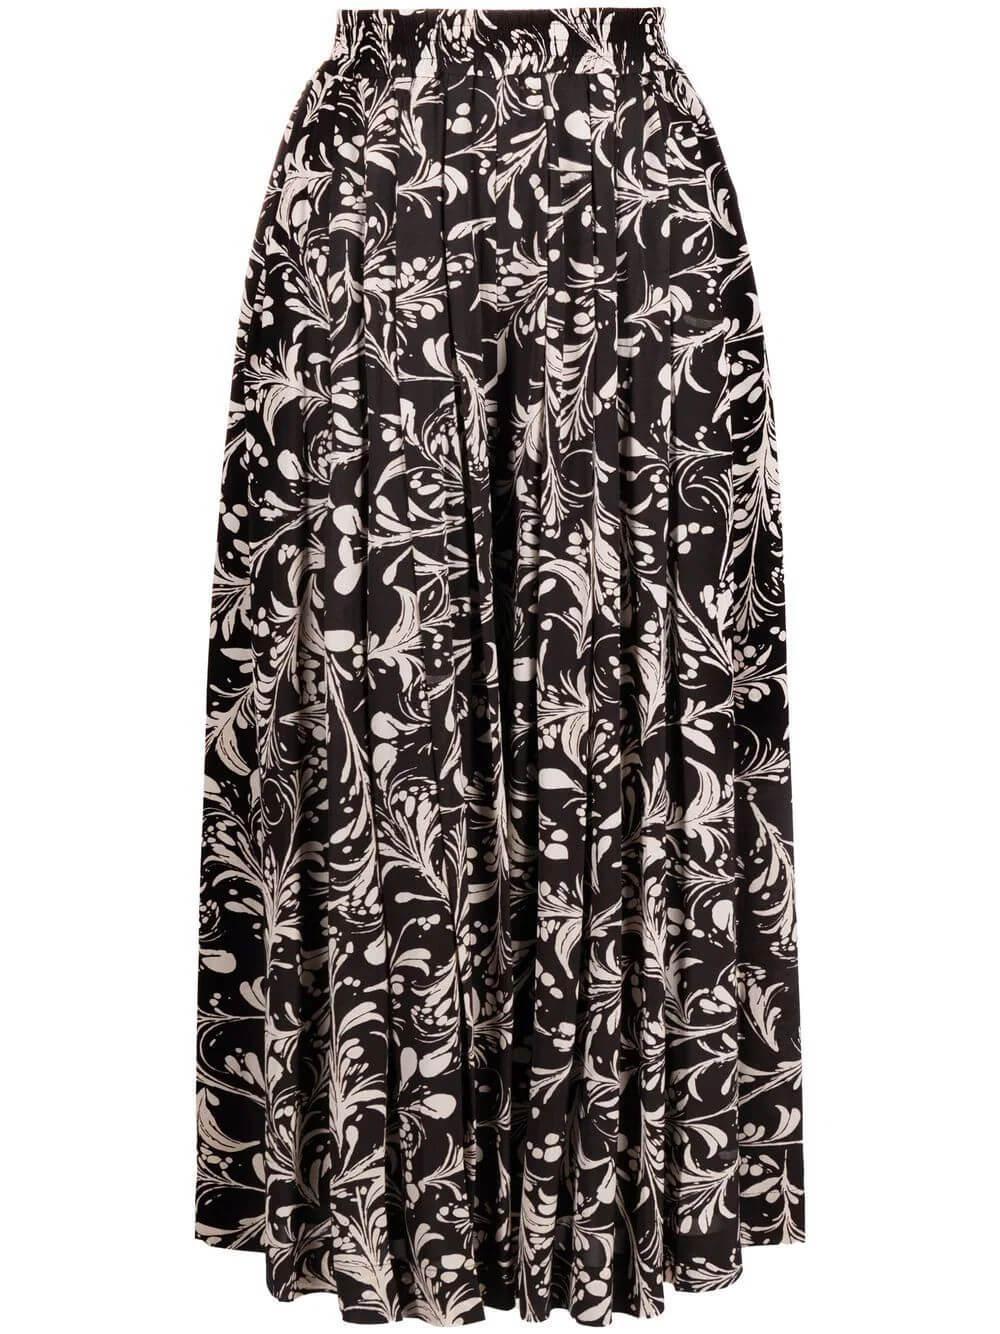 Clotilde Printed Midi Skirt Item # 21APA1964-21A022E